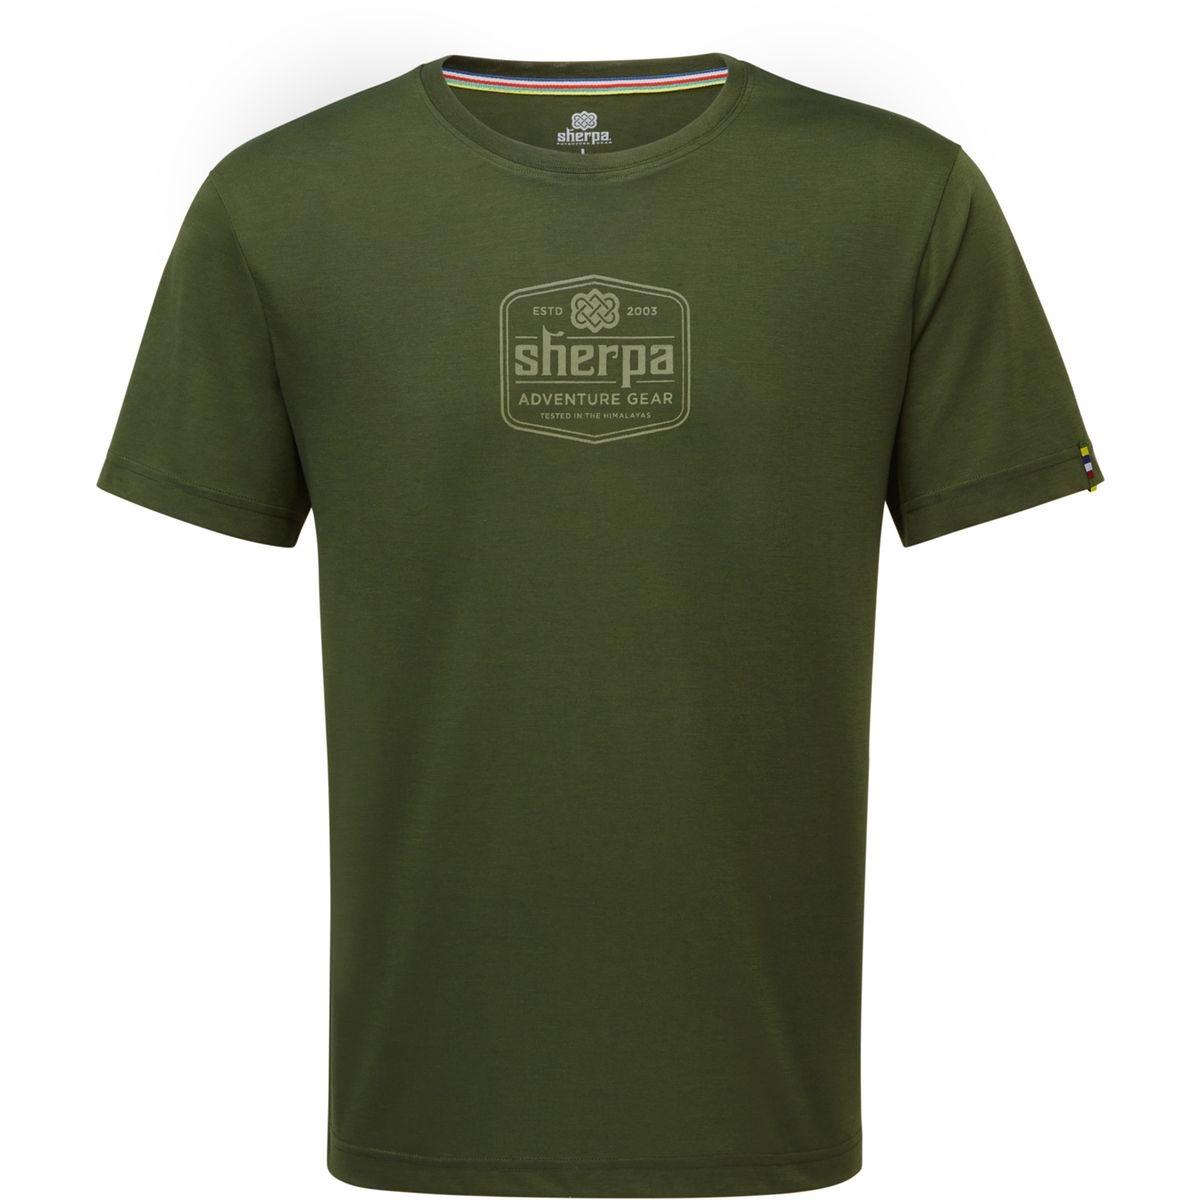 Tashi - T-shirt manches courtes Homme - vert